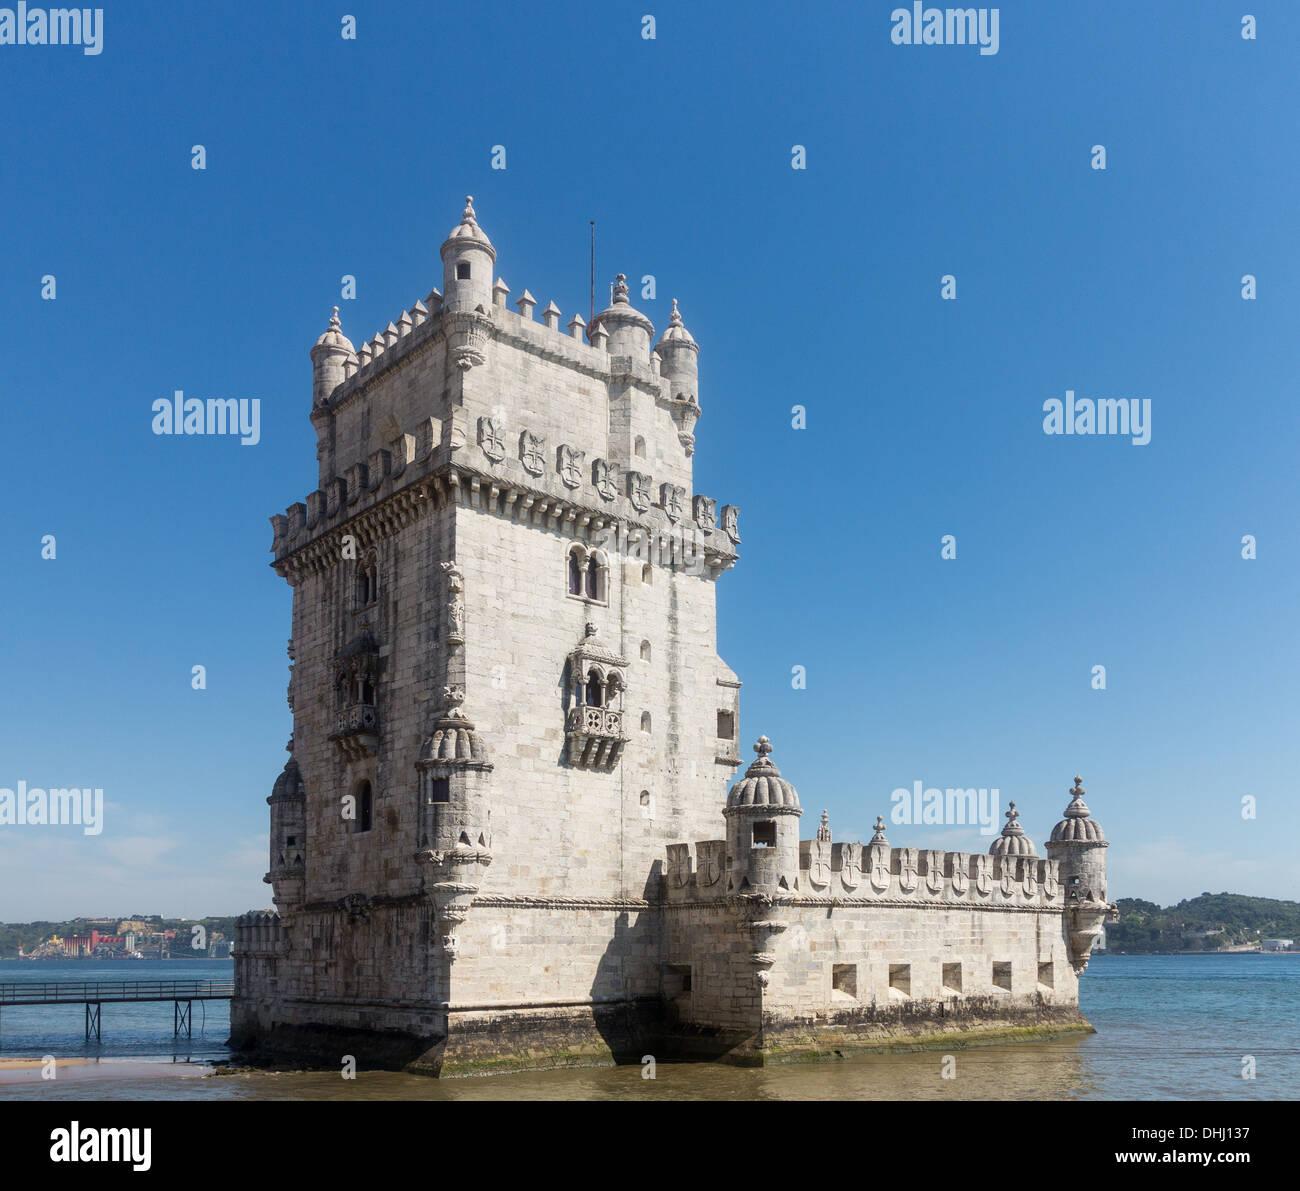 Belem Tower or Tower of St Vincent in Belem near Lisbon, Portugal. - Stock Image